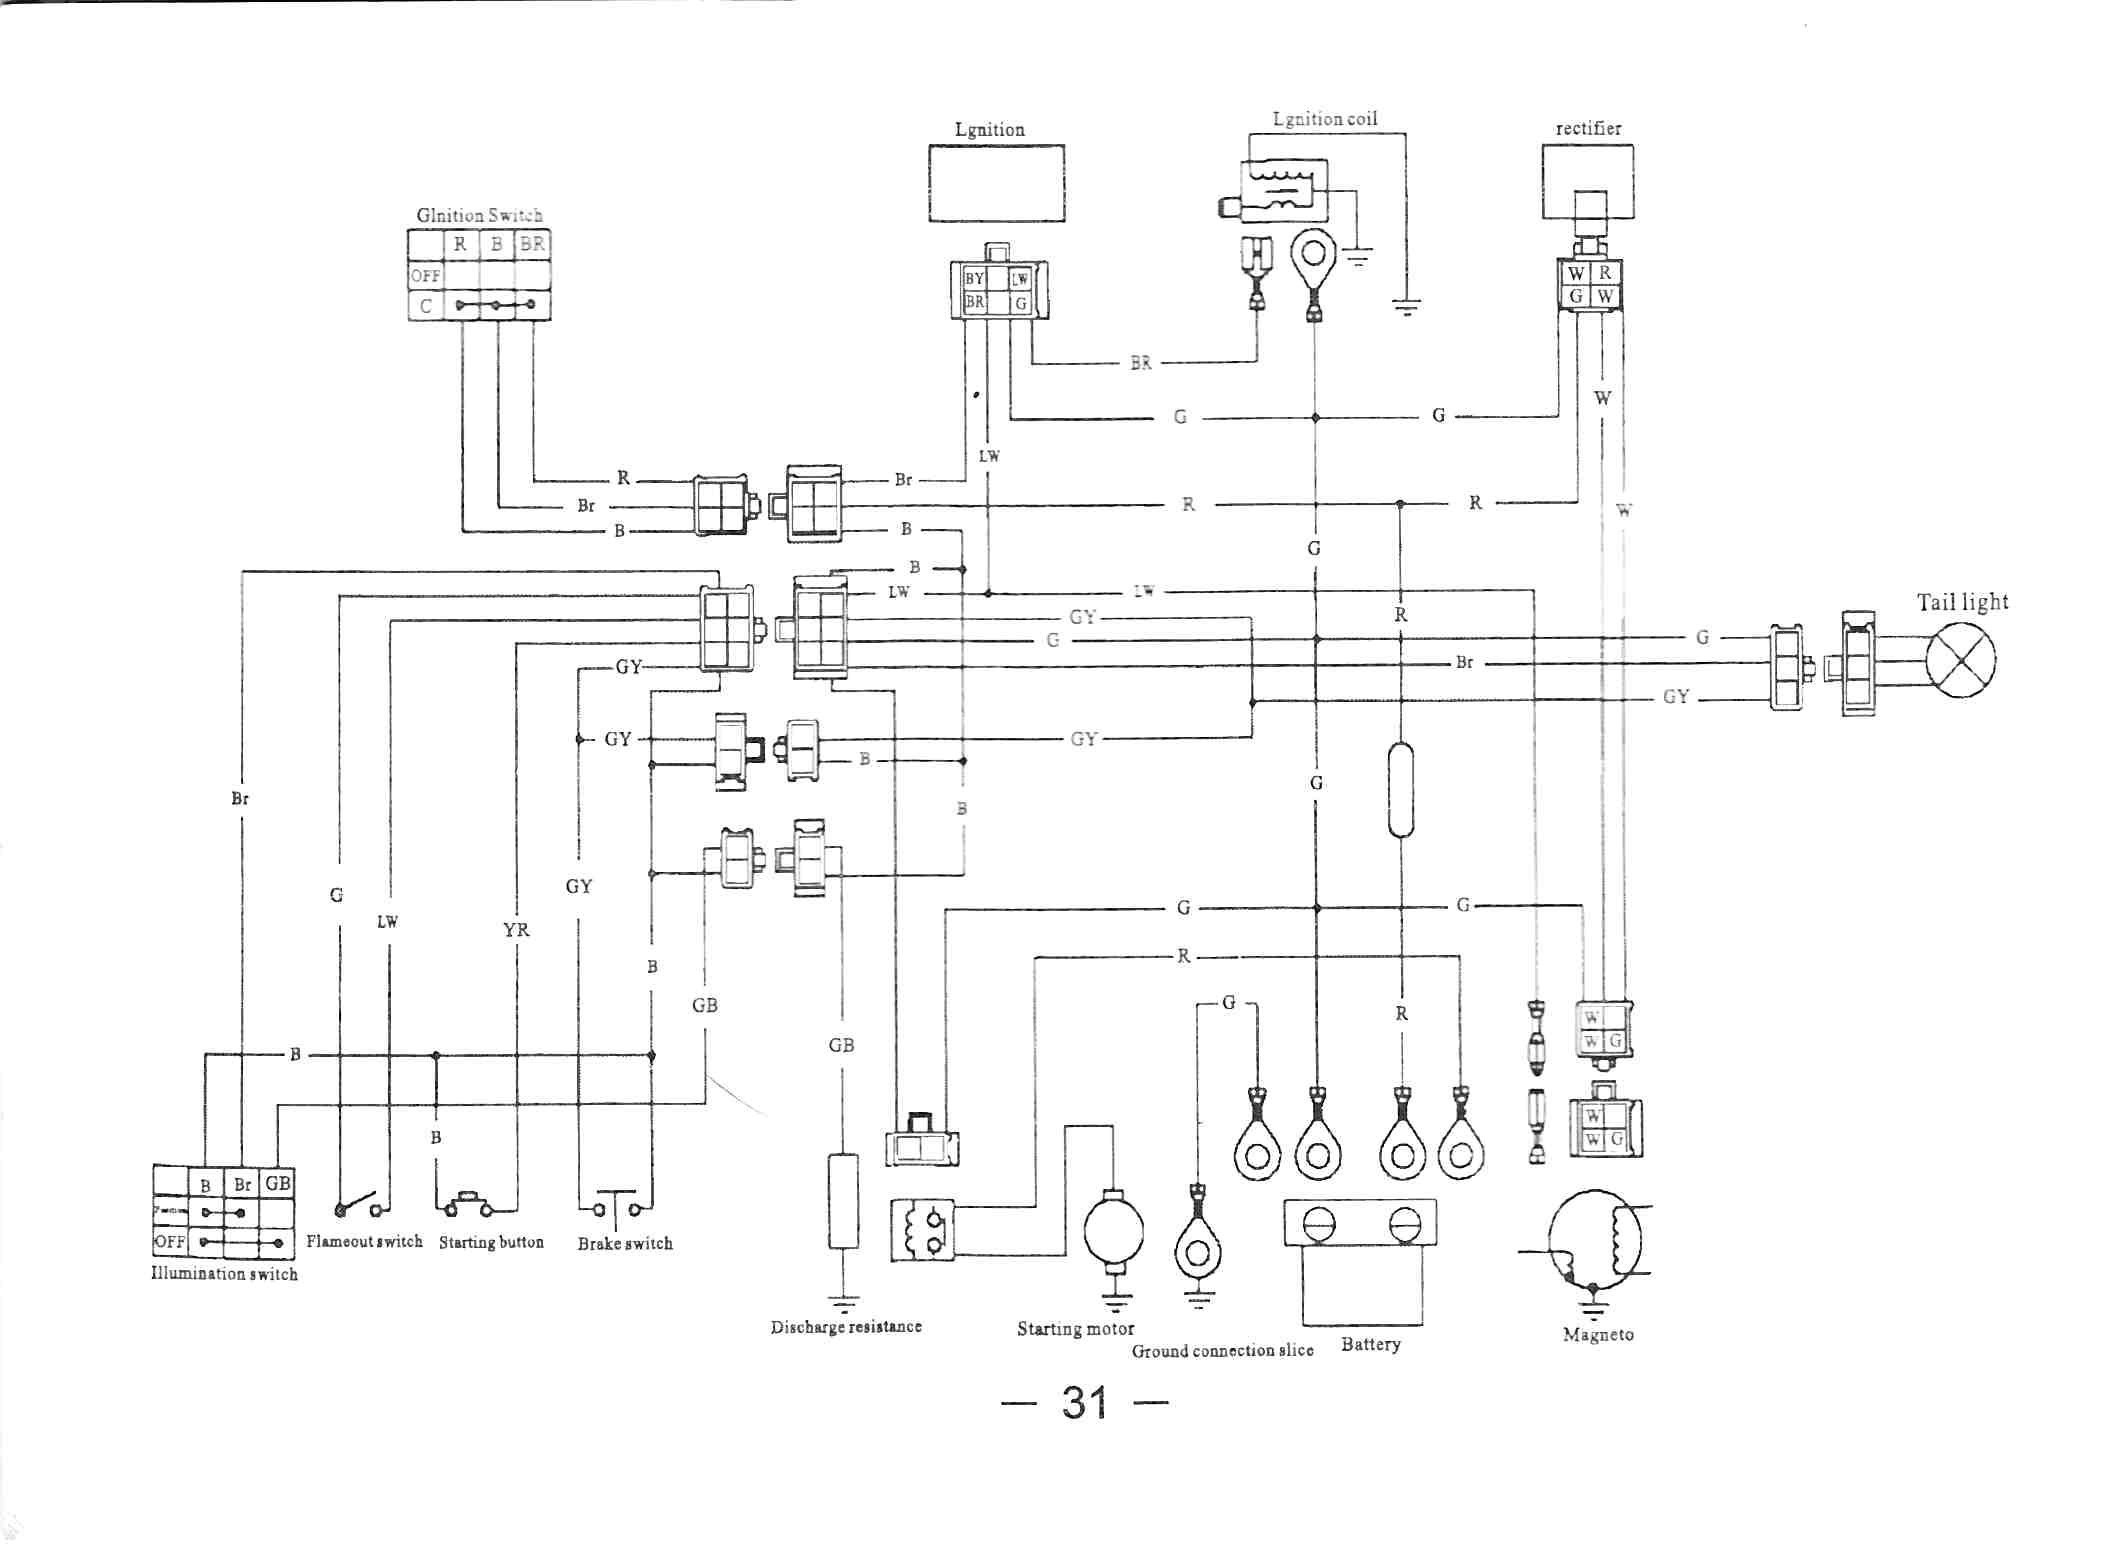 Suzuki Quadrunner 160 Key Wiring - Wiring Diagram Data - Chinese Quad Wiring Diagram